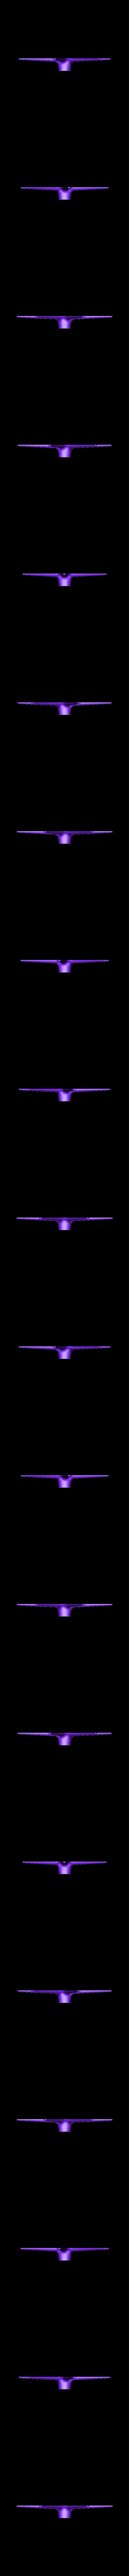 mini_tentacles_bottom.STL Download free STL file Mini Tentacles • 3D print model, OgoSport